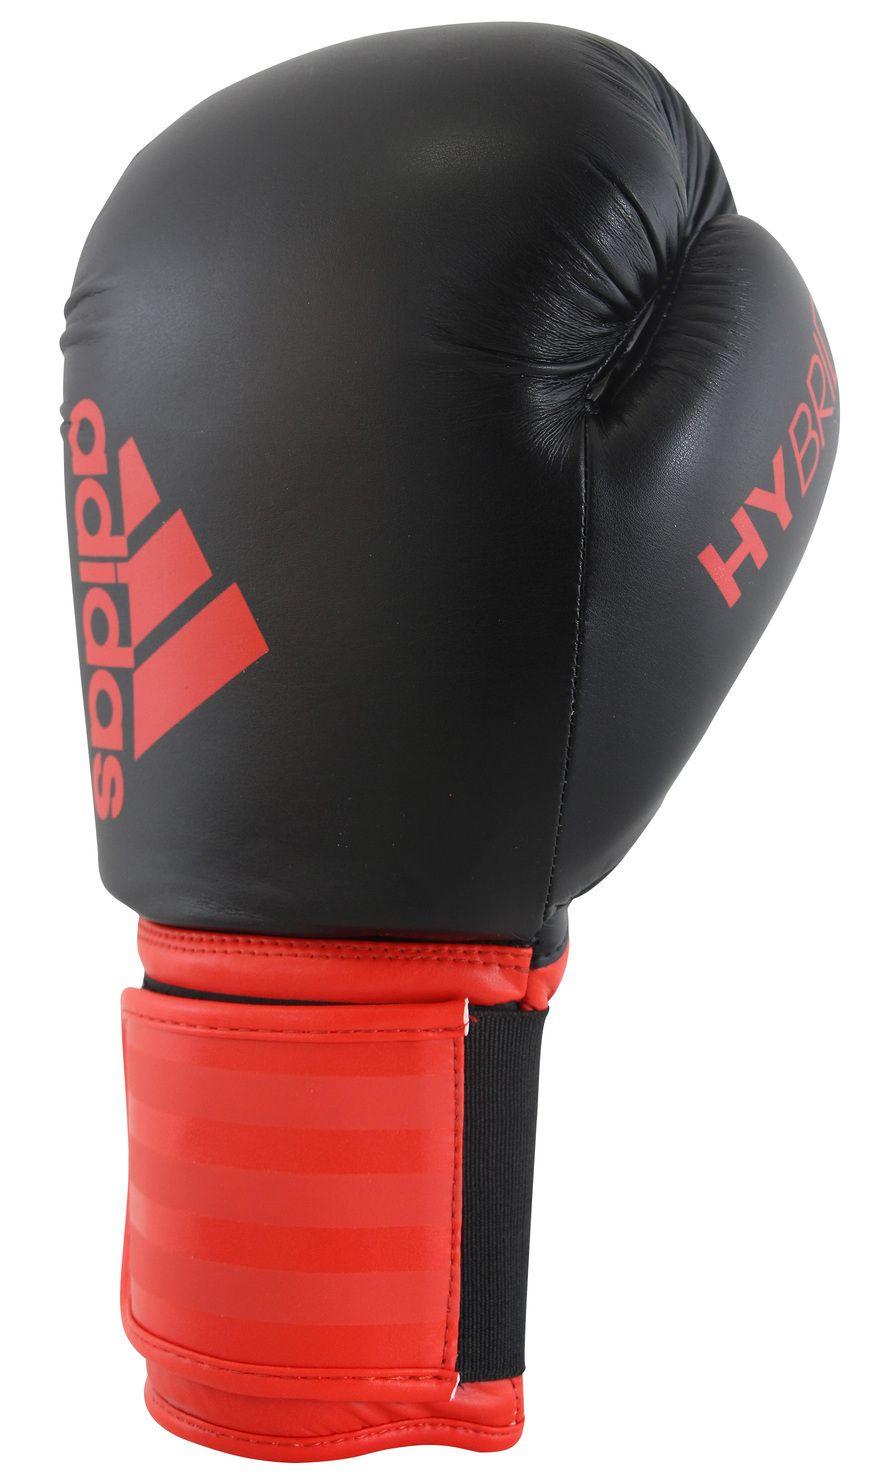 Luva de Boxe Adidas Hybrid 100 Red/Black